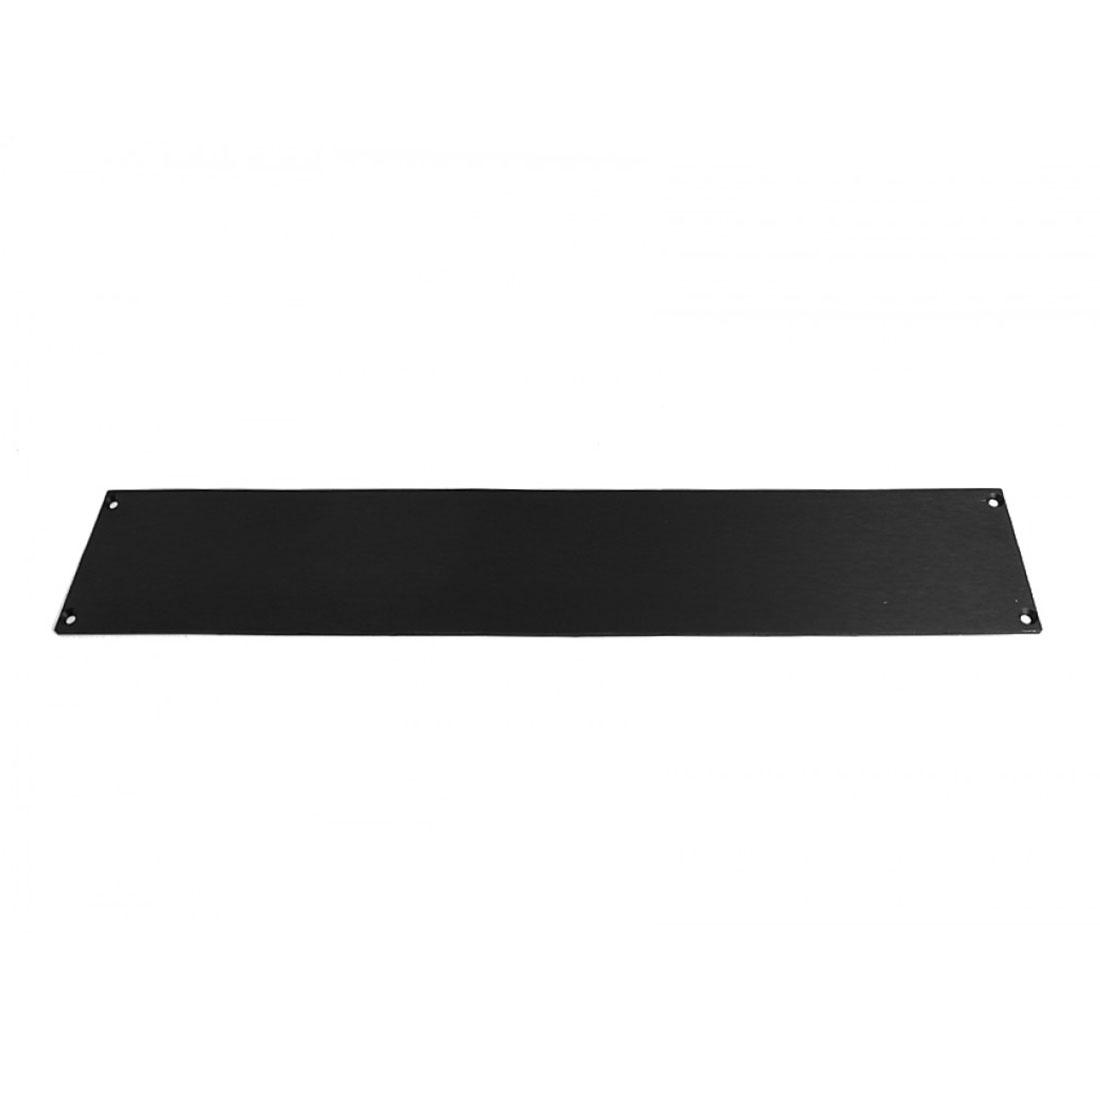 1NSL02170N - 2U rack krabice s lištou, 170mm, 10mm - panel černý